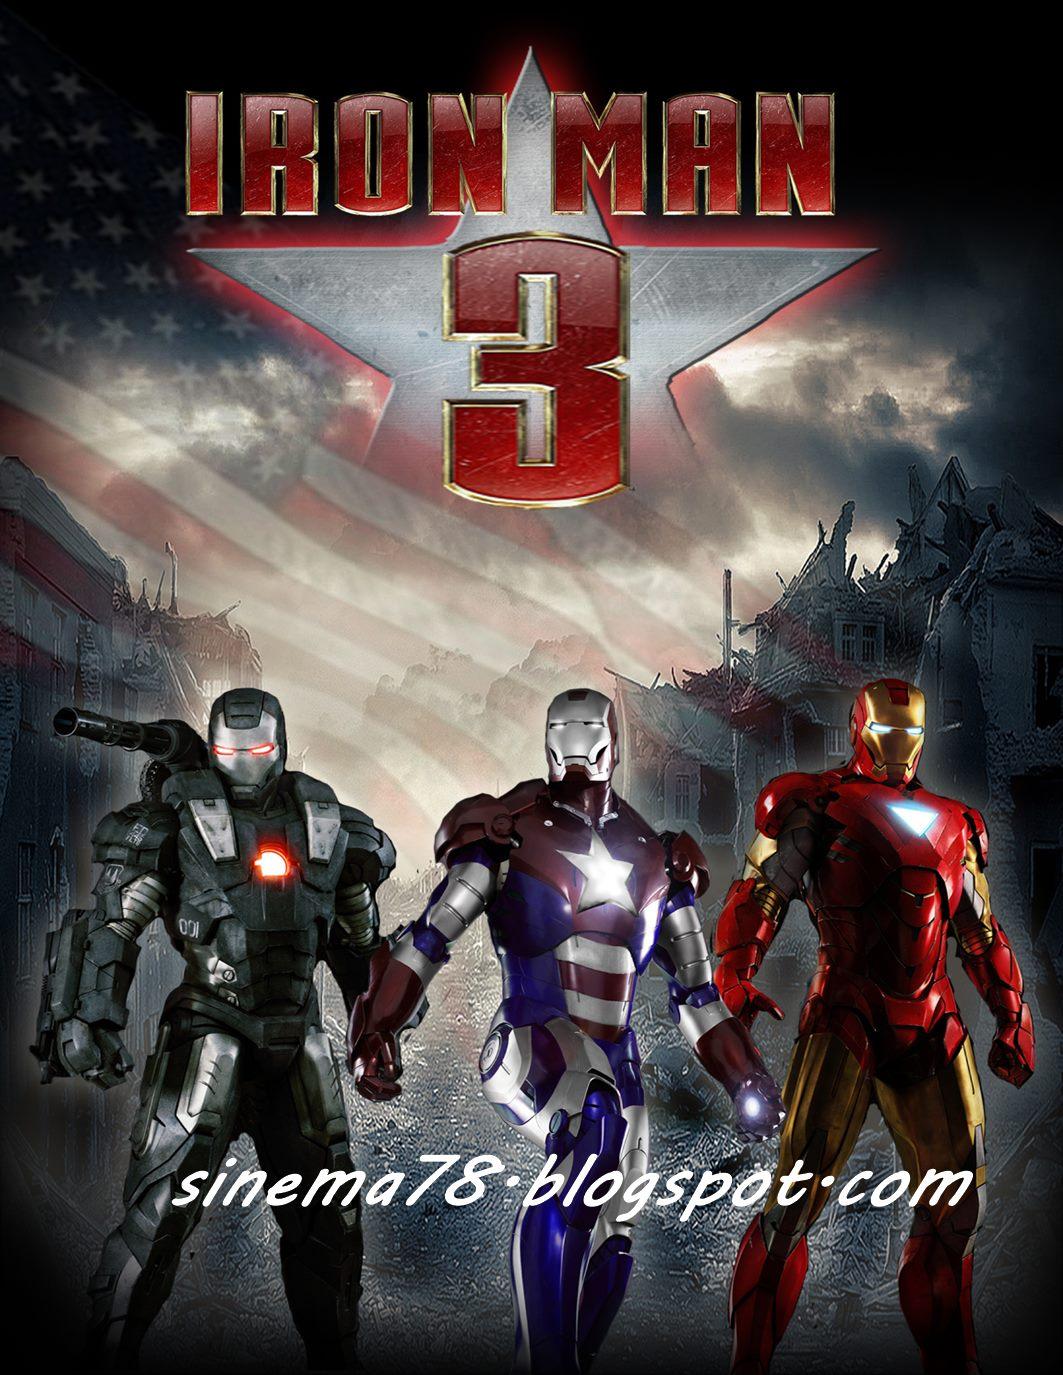 download film iron man 3 terbaru 2013 full movie sinema78